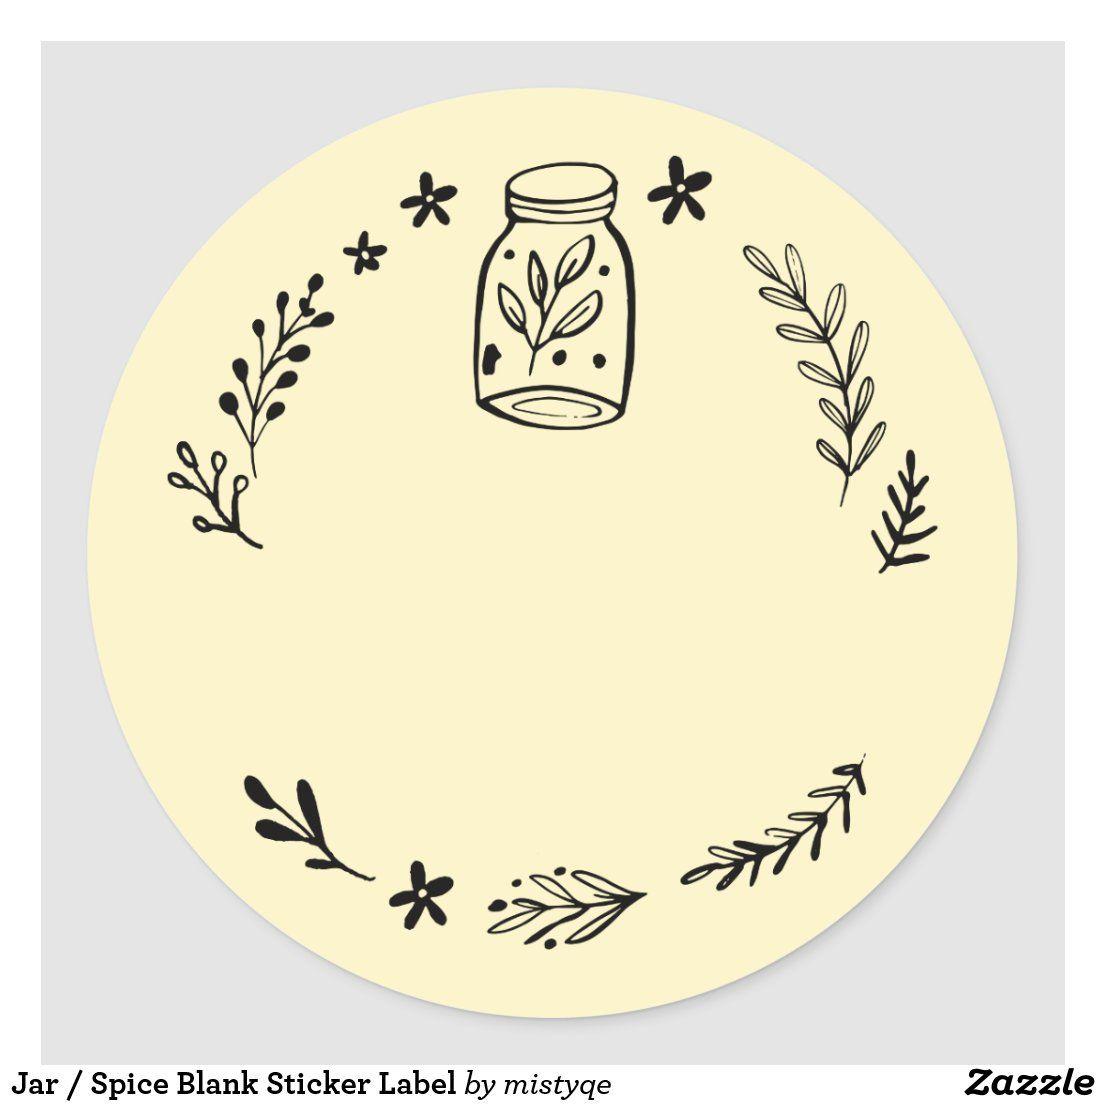 Jar Spice Blank Sticker Label Zazzle Com Seni Buku Seni Inspirasi Seni